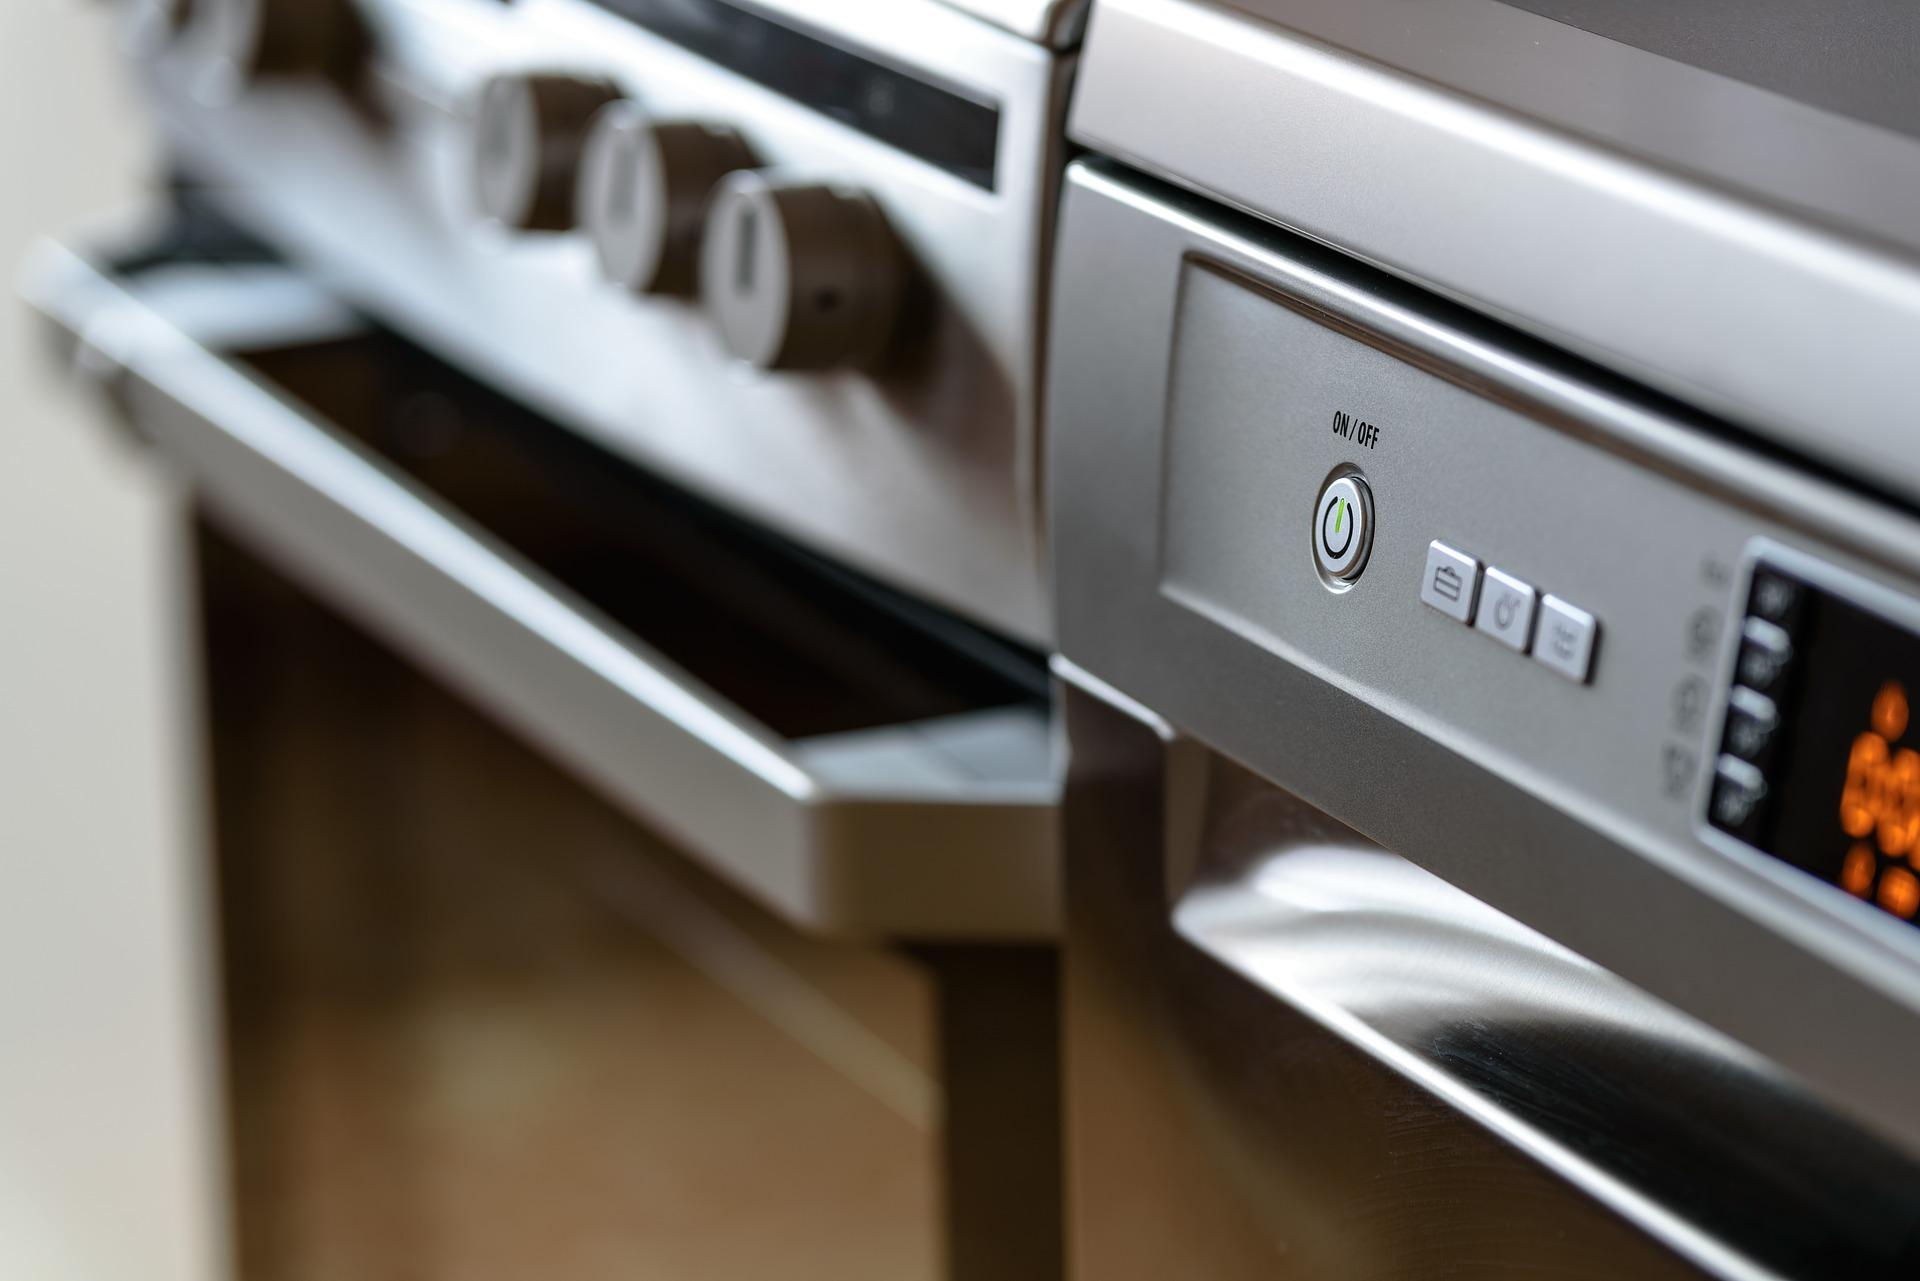 de nieuwste technologieën voor in keukens. Welke technologie implementeer je in je eigen keuken? #keuken #keukeninspiratie #keukenapparaten